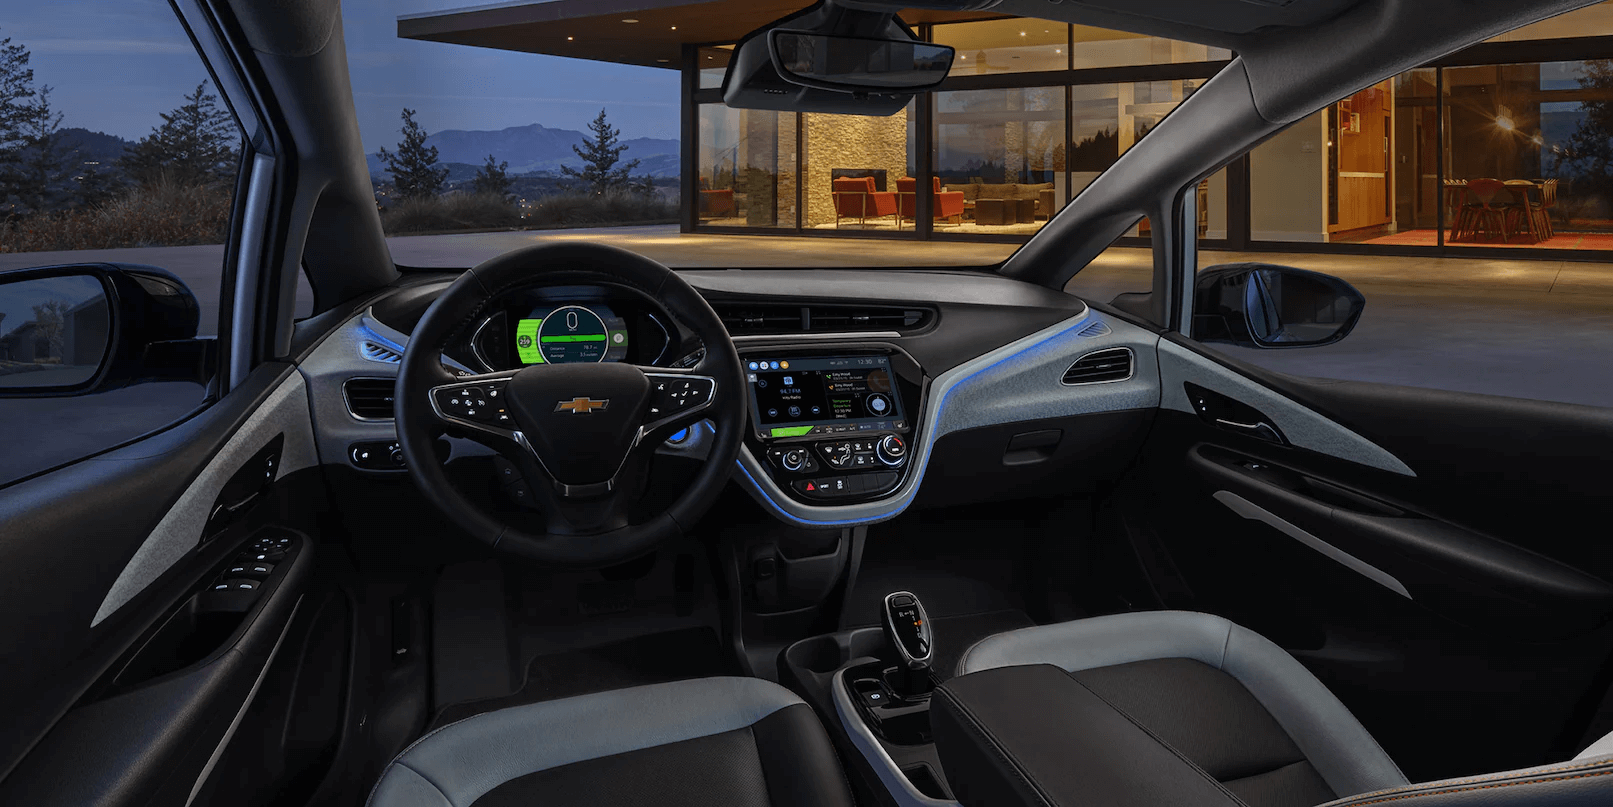 2021 Bolt EV Electric Car Exterior Photo: Side View.